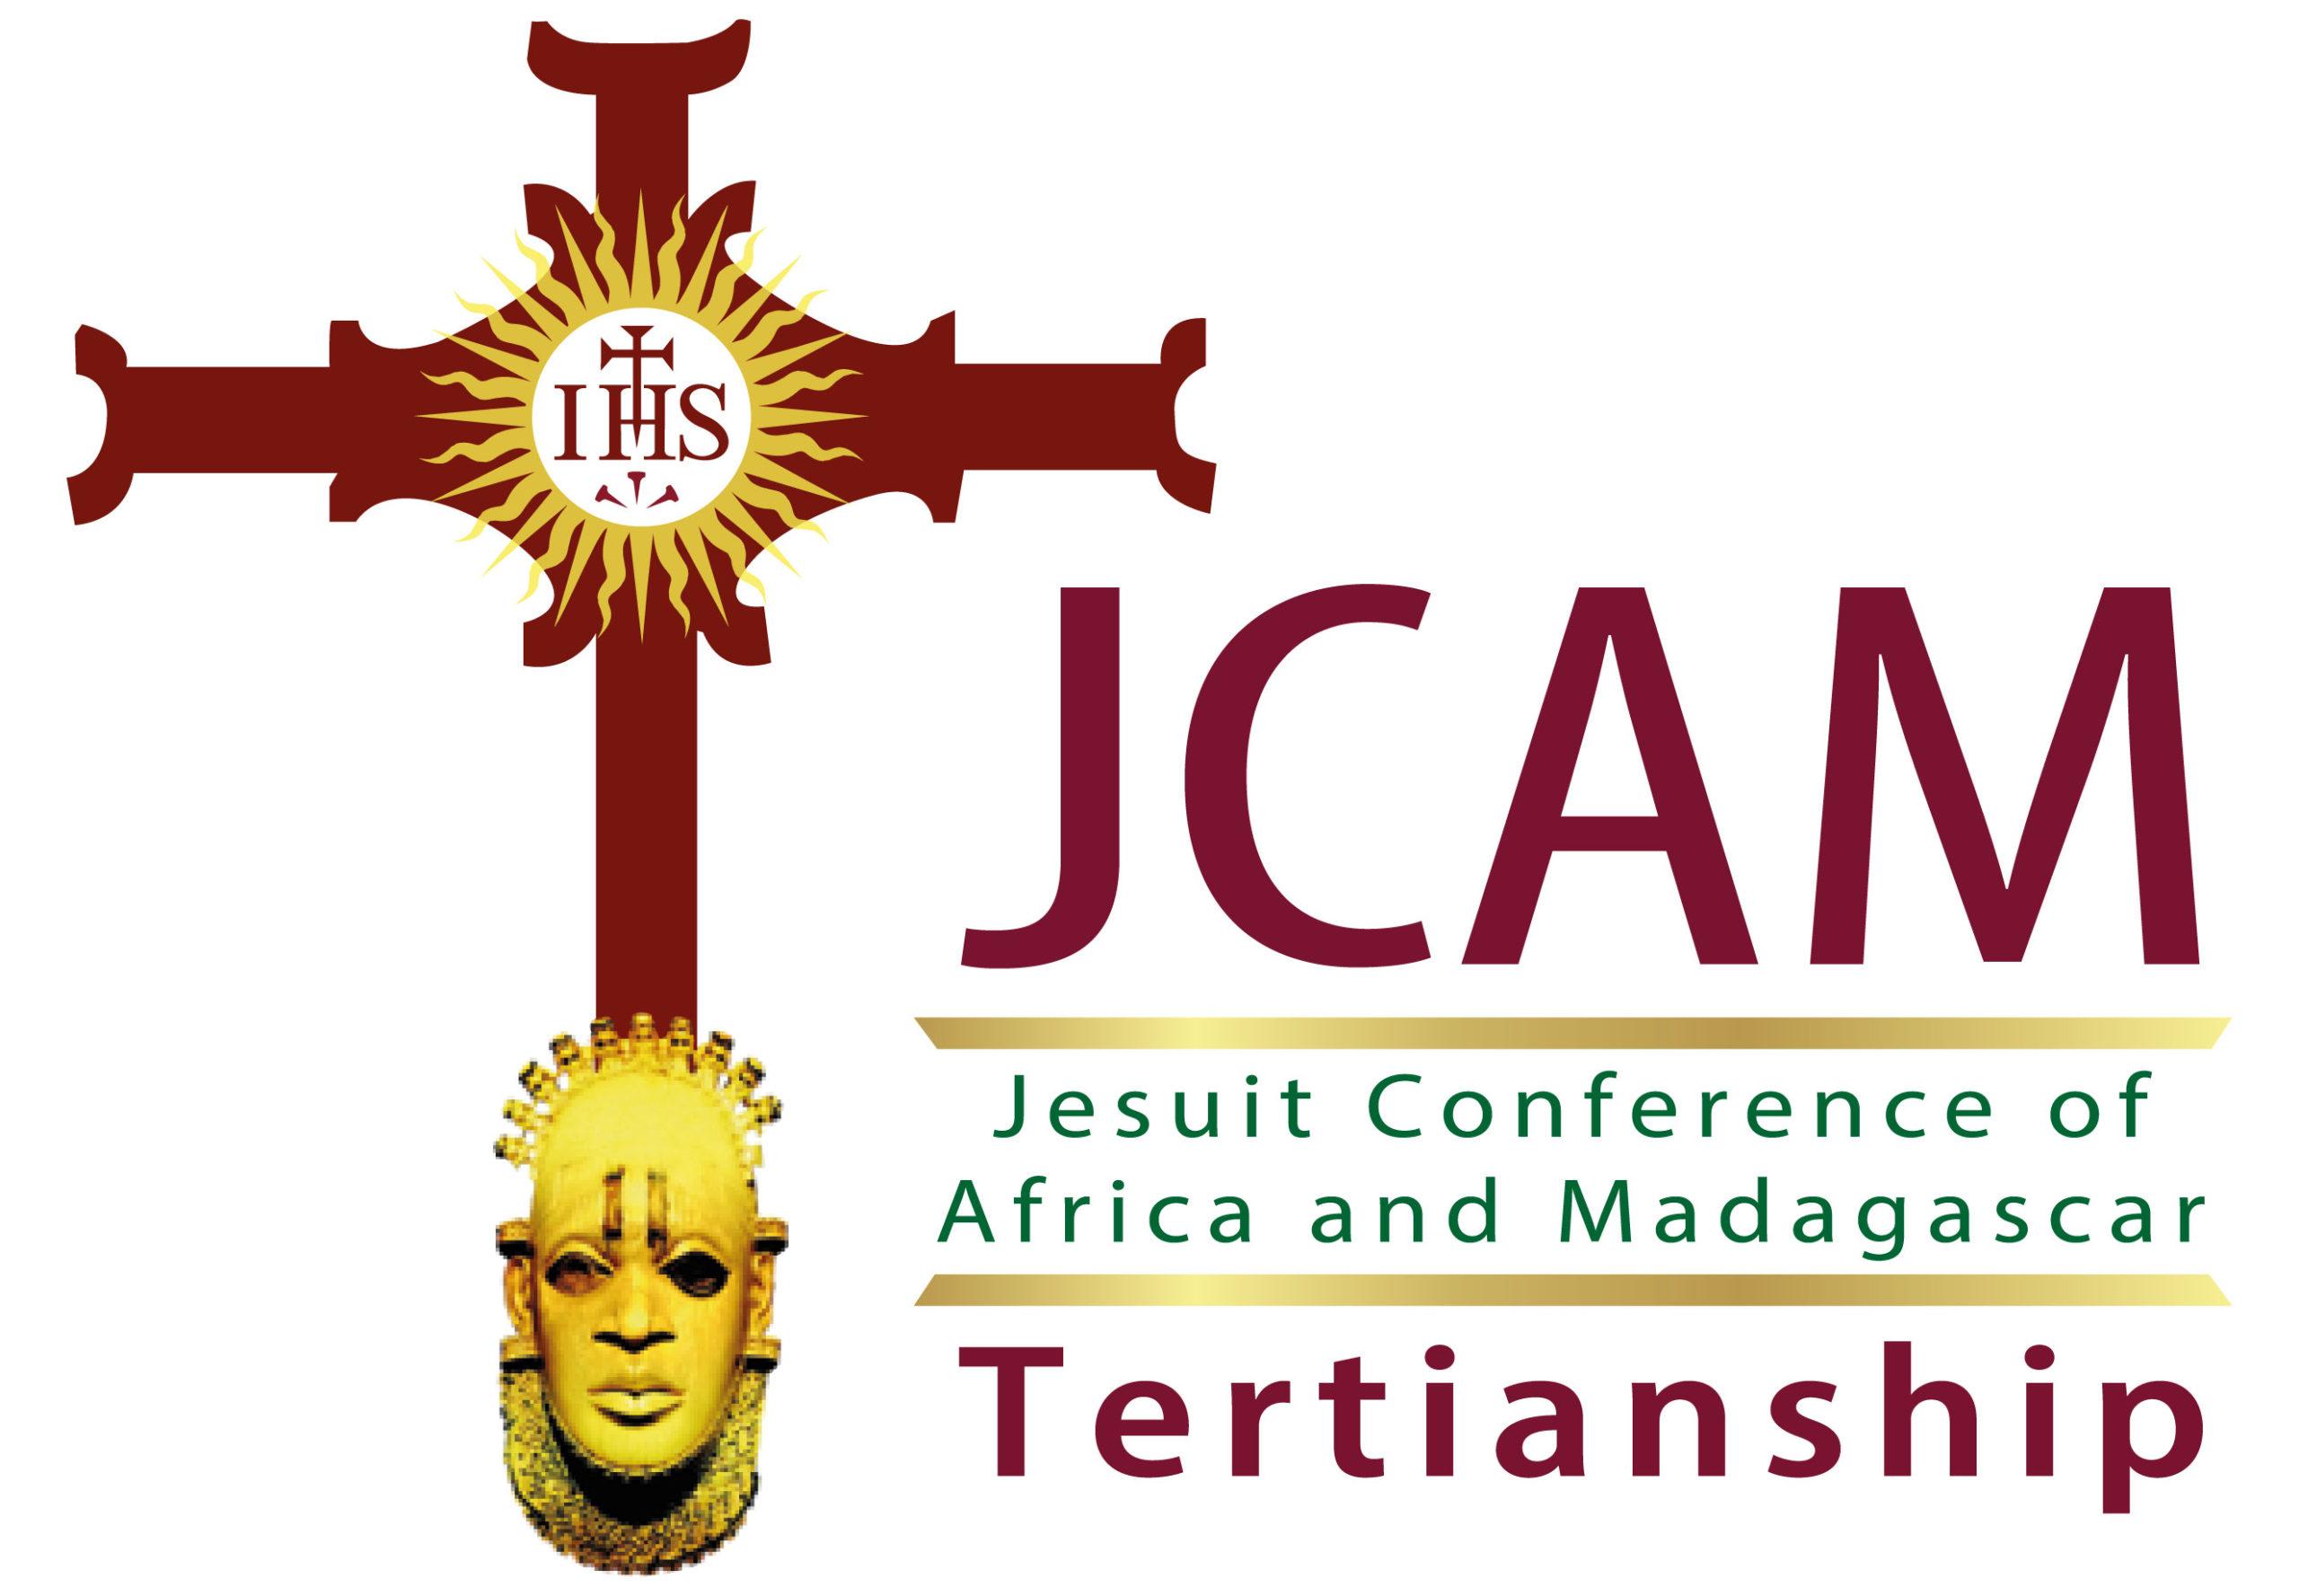 JCAM Tertianship